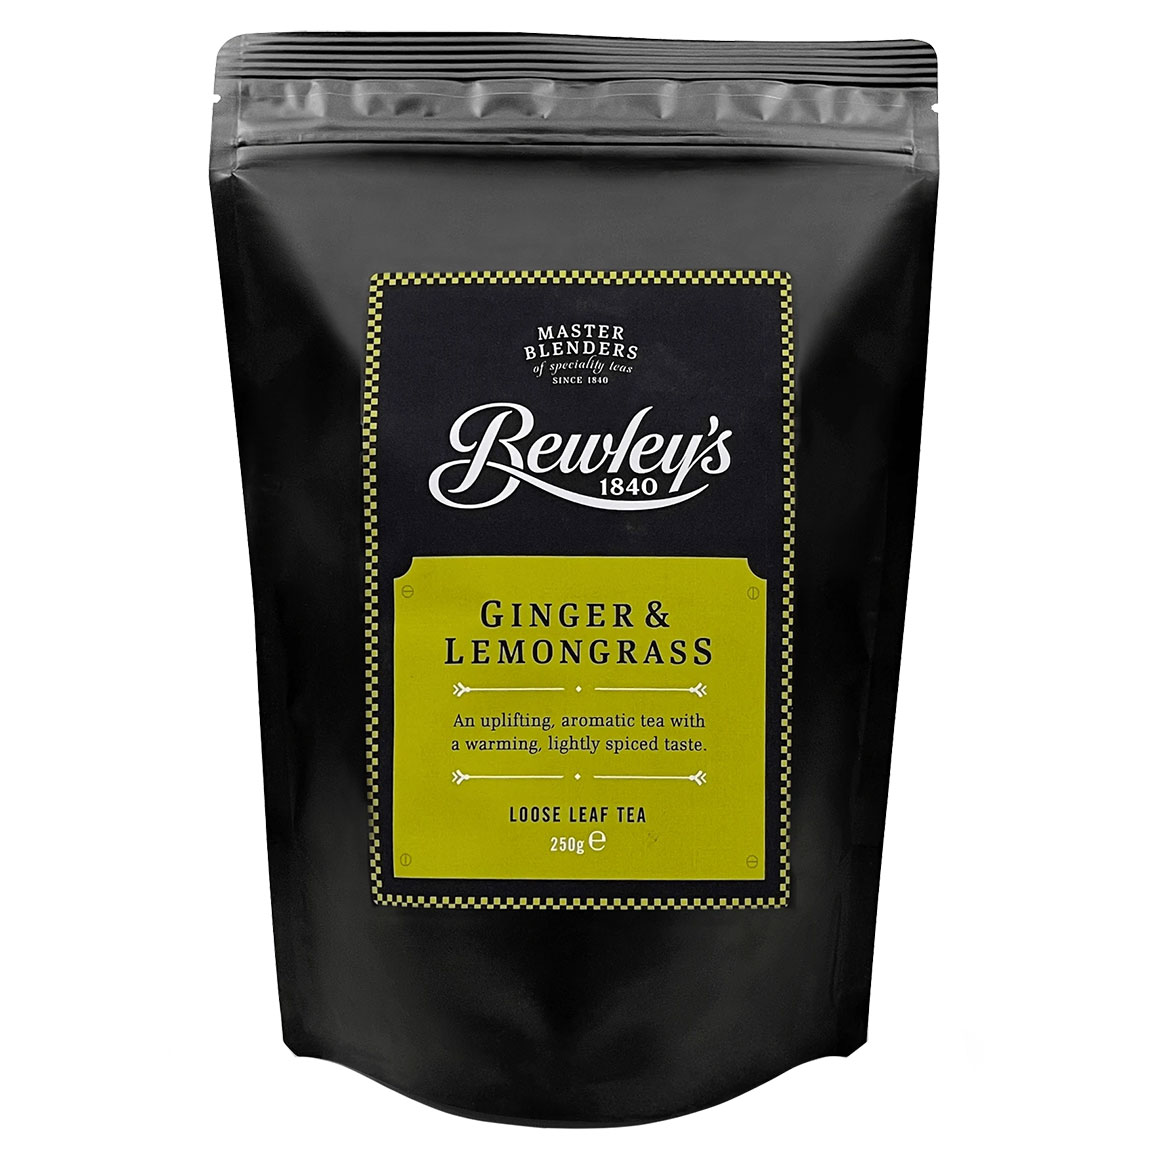 Bewley's Ginger & Lemongrass Loose Leaf Tea